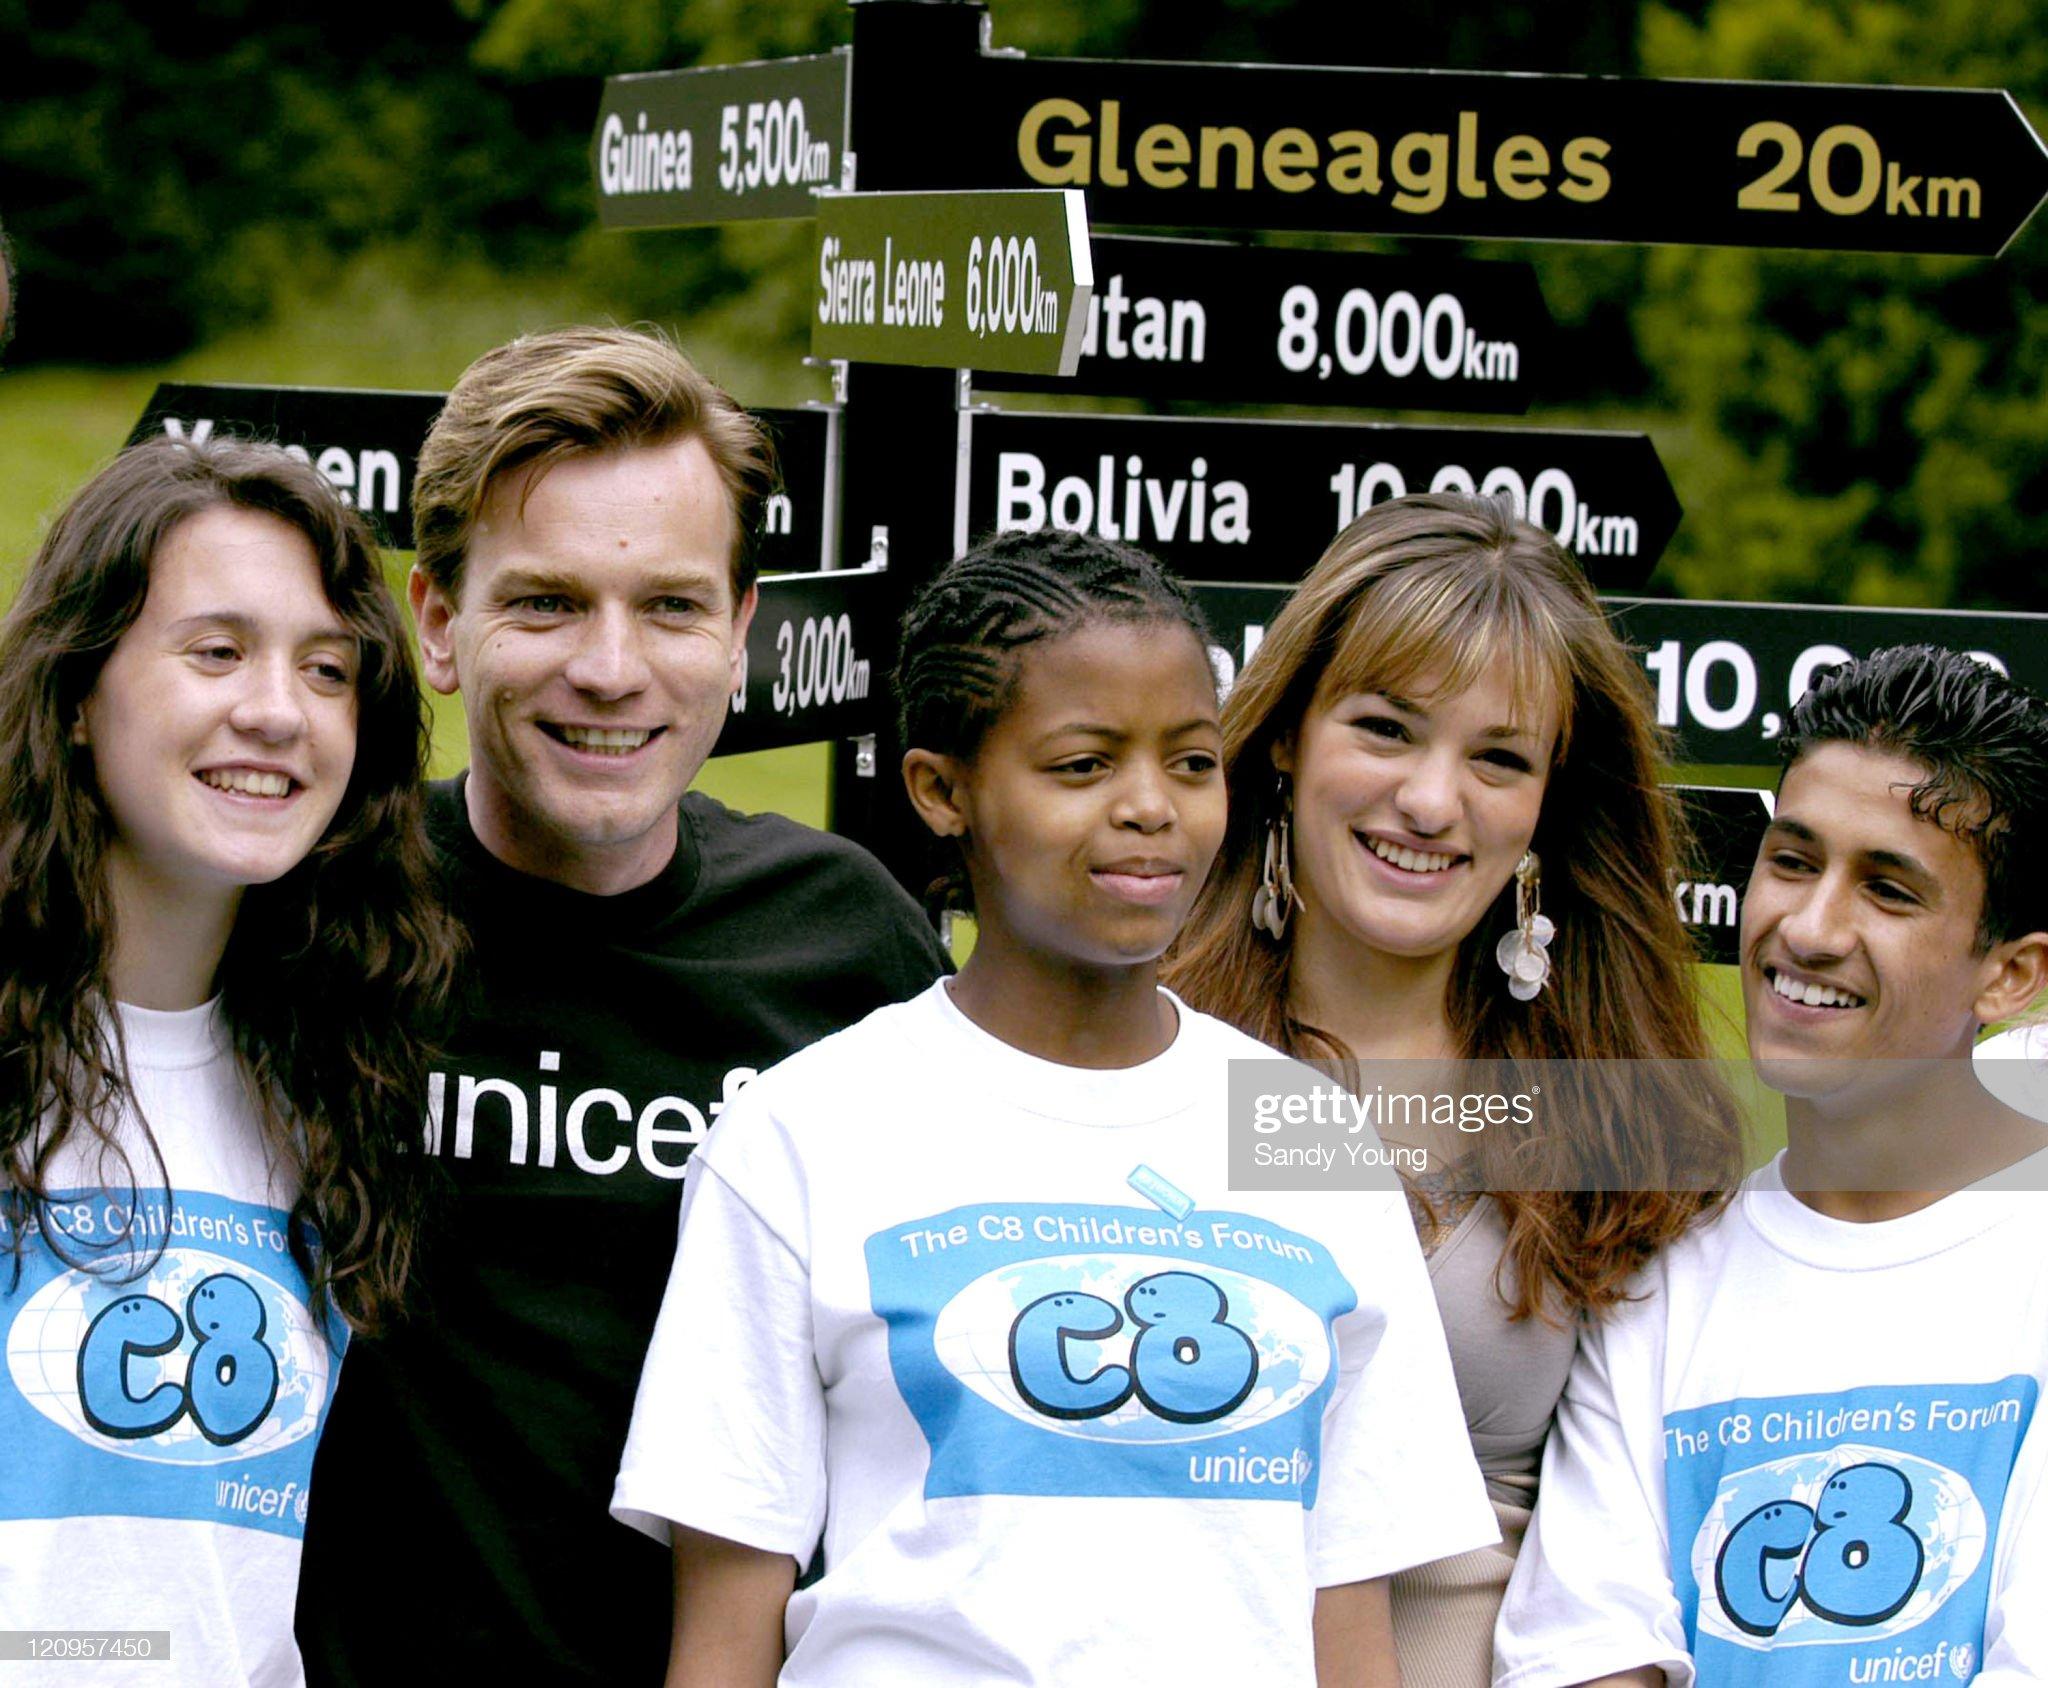 UNICEF C8 Launches Children's Summit with Ewan McGregor and Nicola Benedetti - July 3, 2005 : Fotografia de notícias